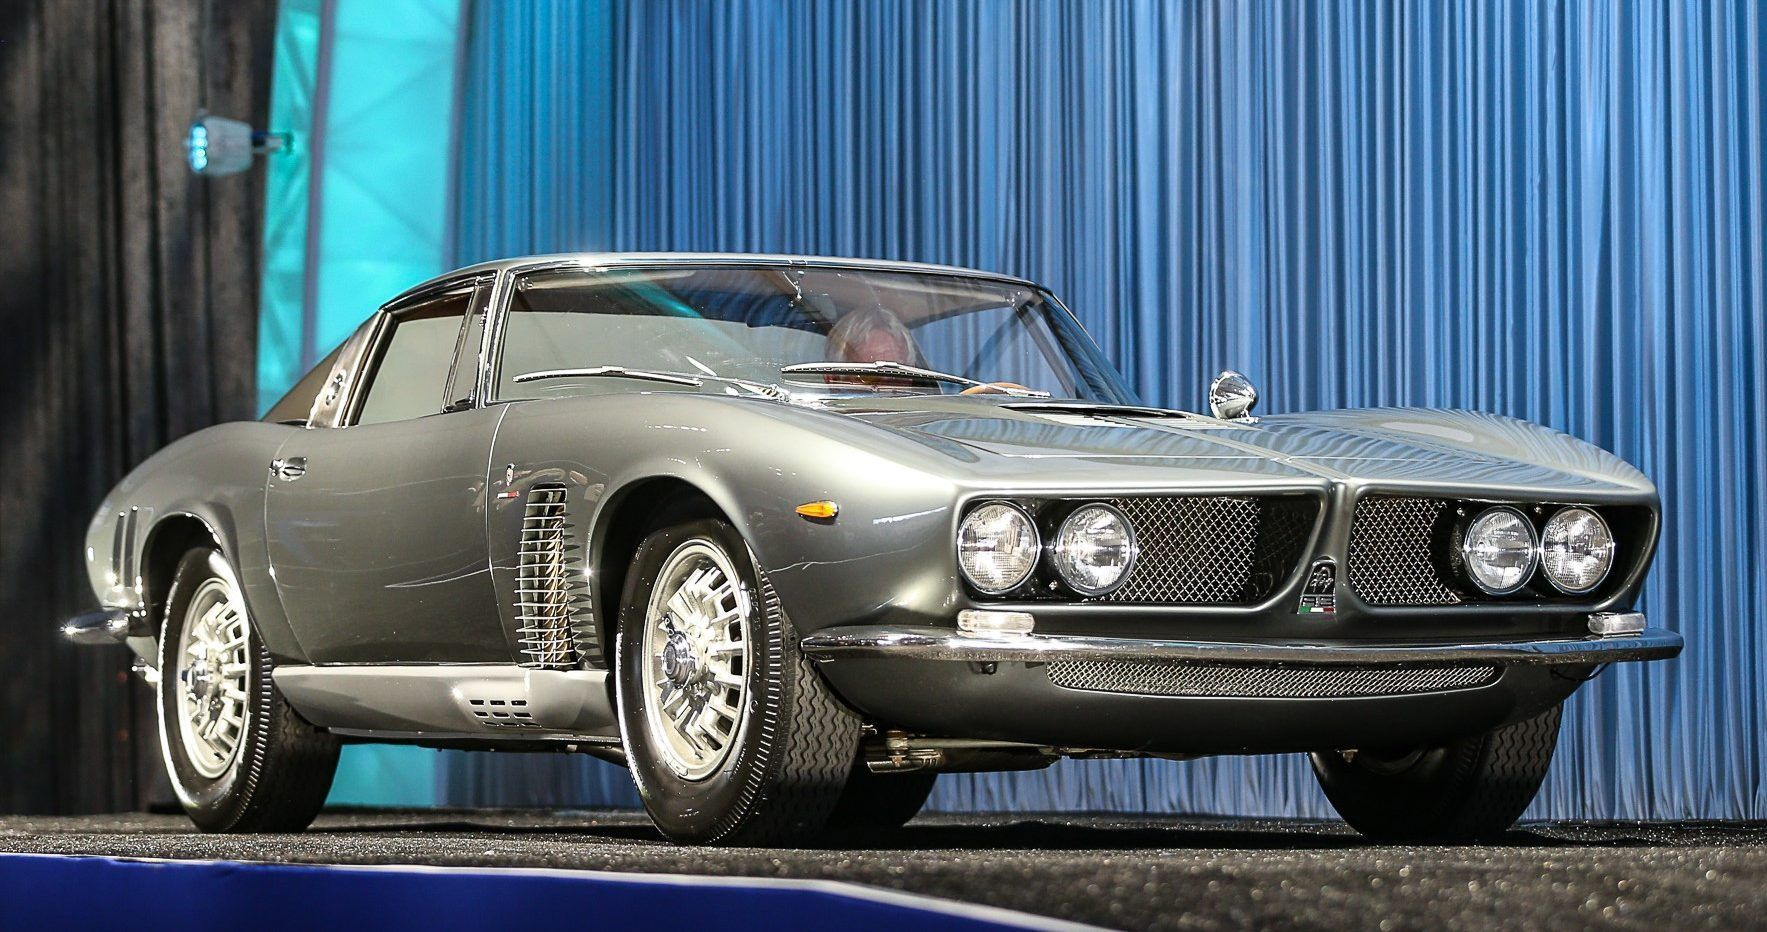 10 Most Beautiful Cars Designed By Giorgetto Giugiaro | HotCars